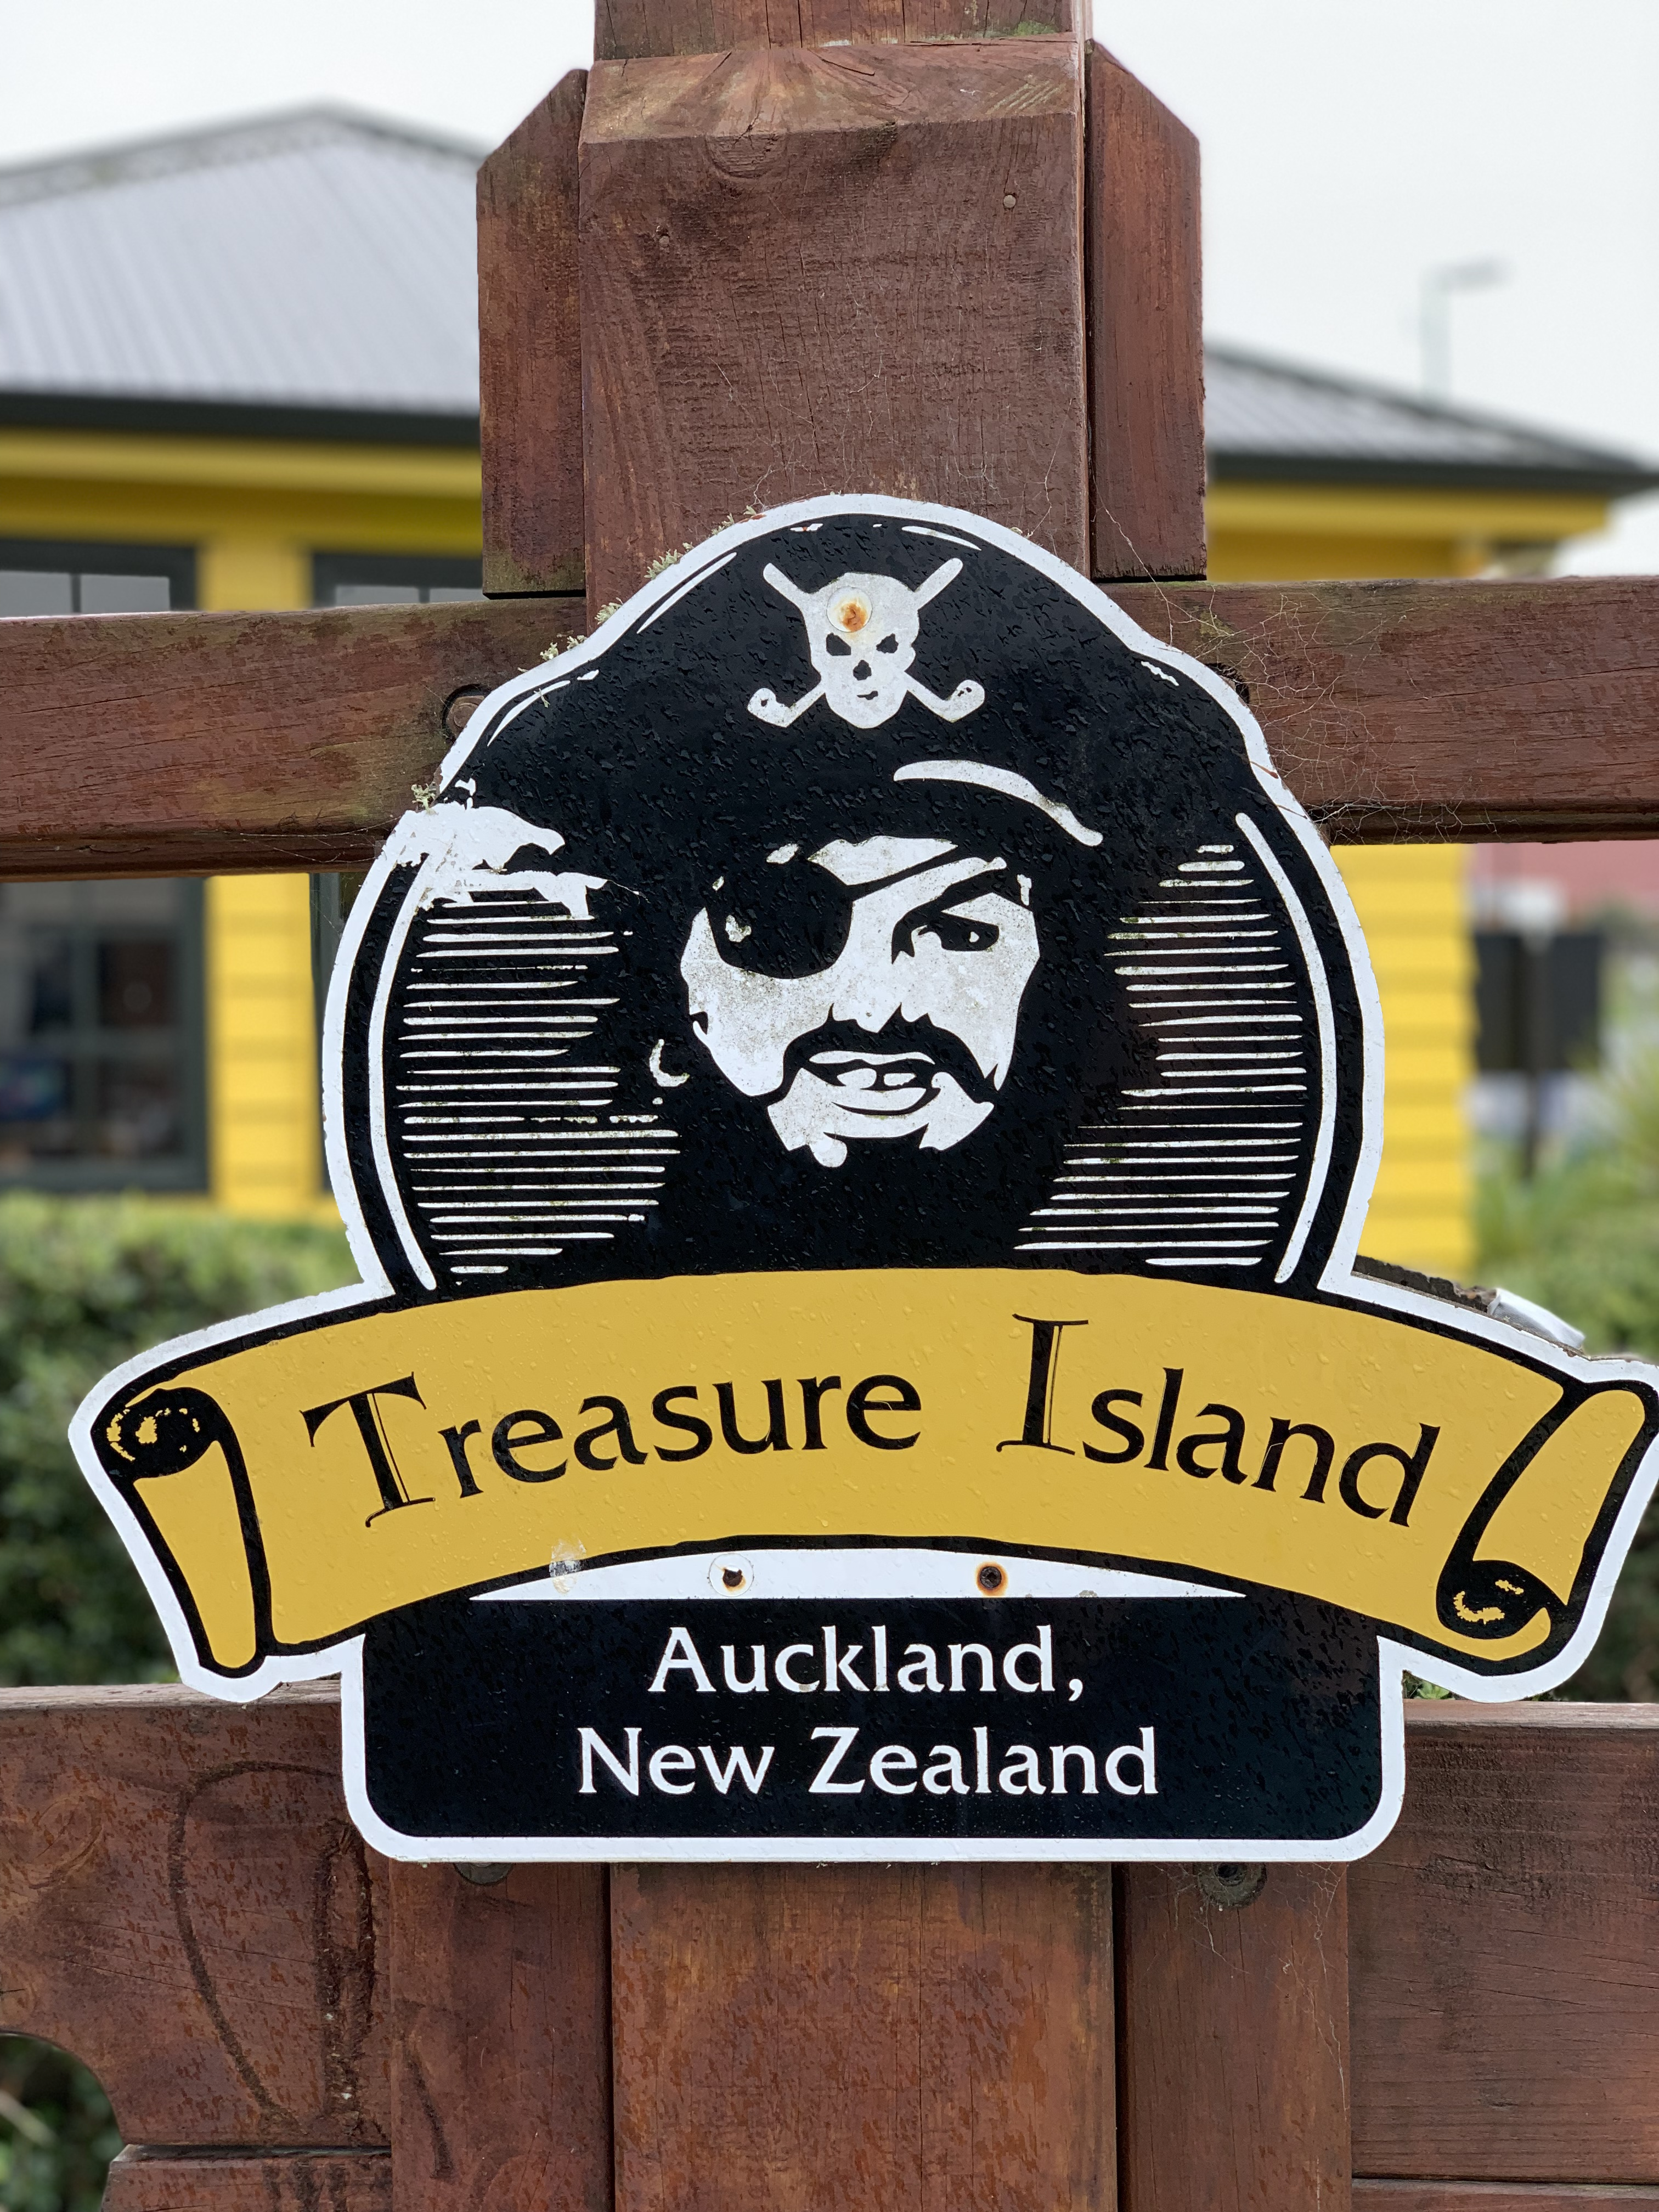 Logo of the treasure island mini golf course in Auckland